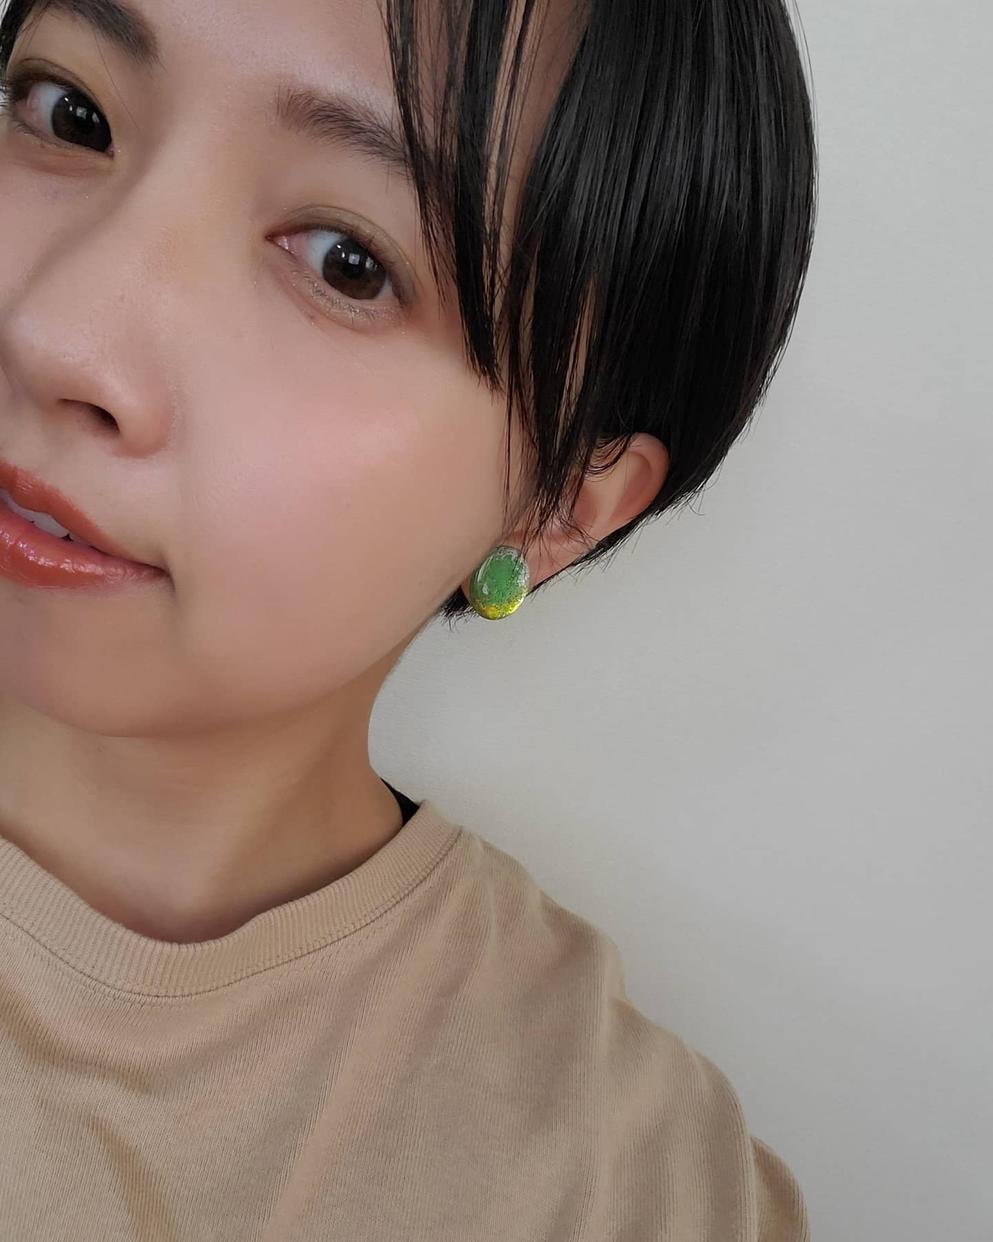 thihi | My favorite♡My free style